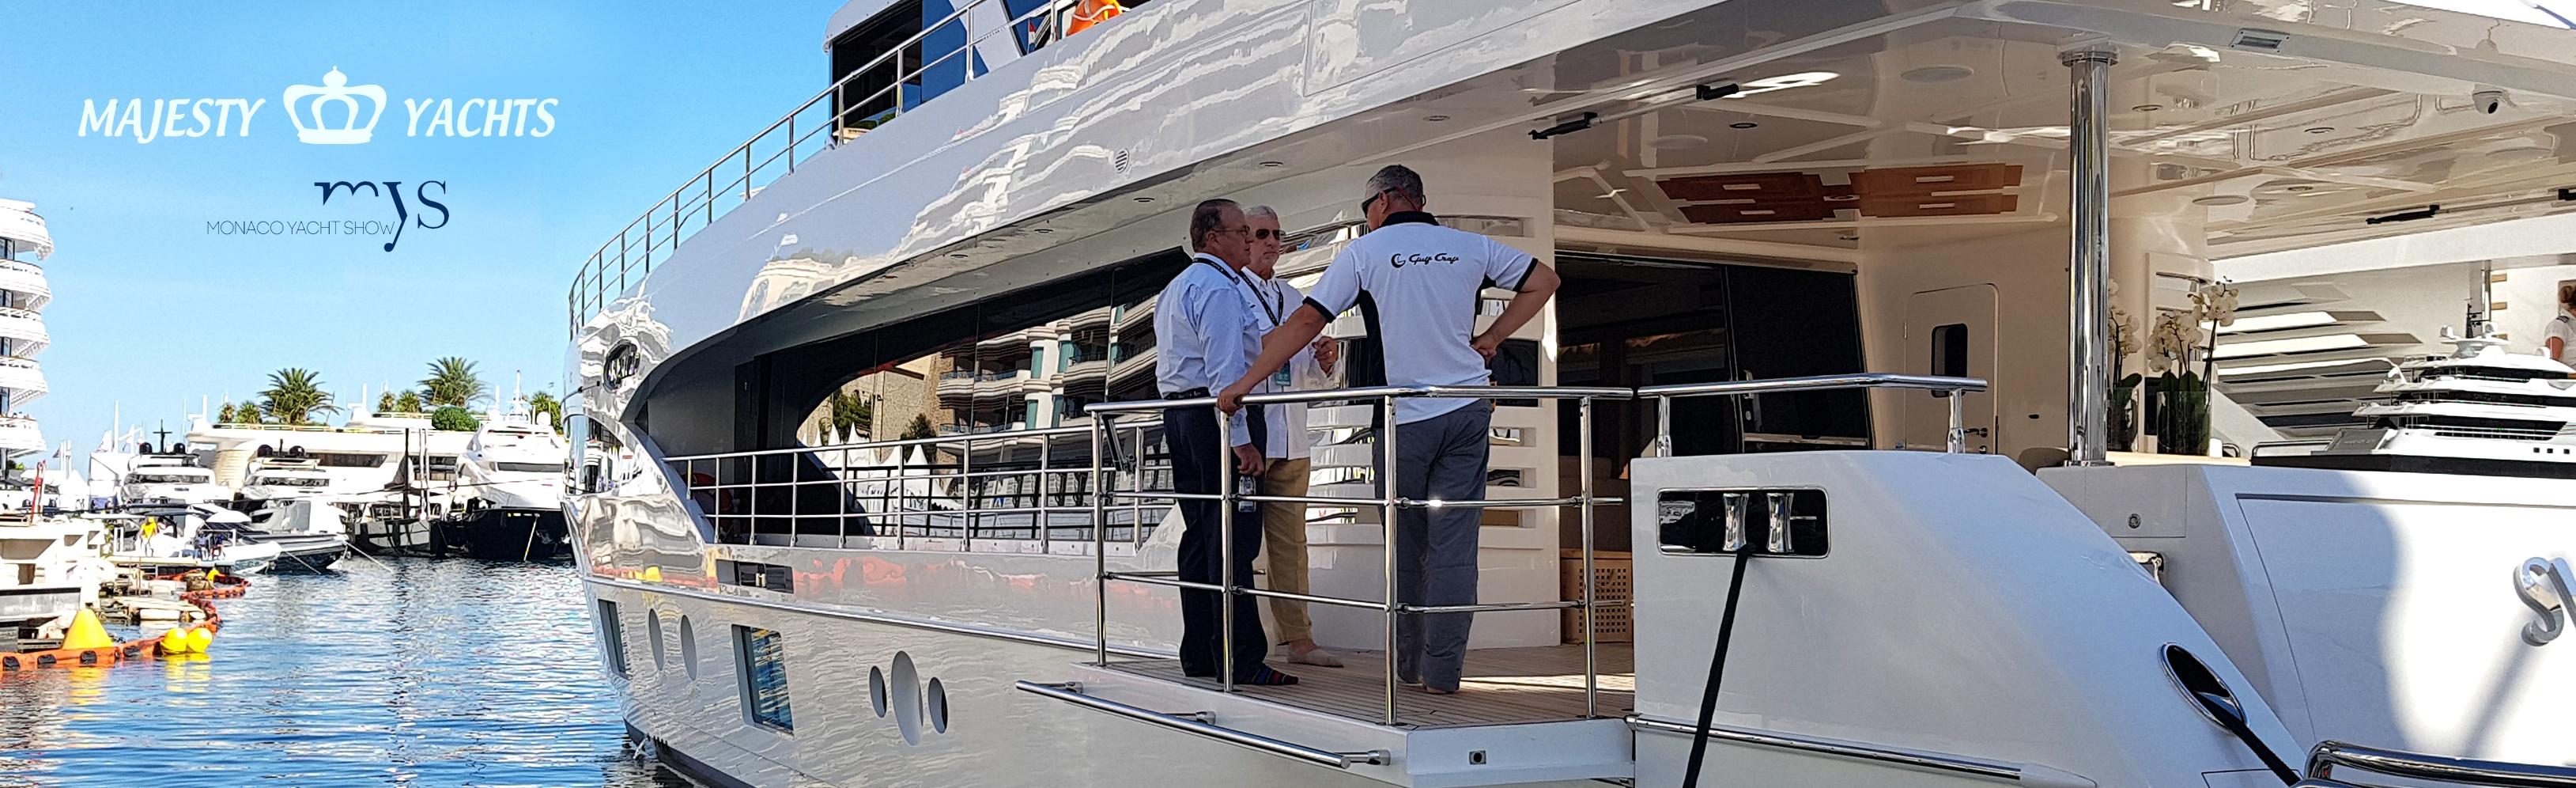 Gulf-Craft,-Monaco-Yacht-Show-cover